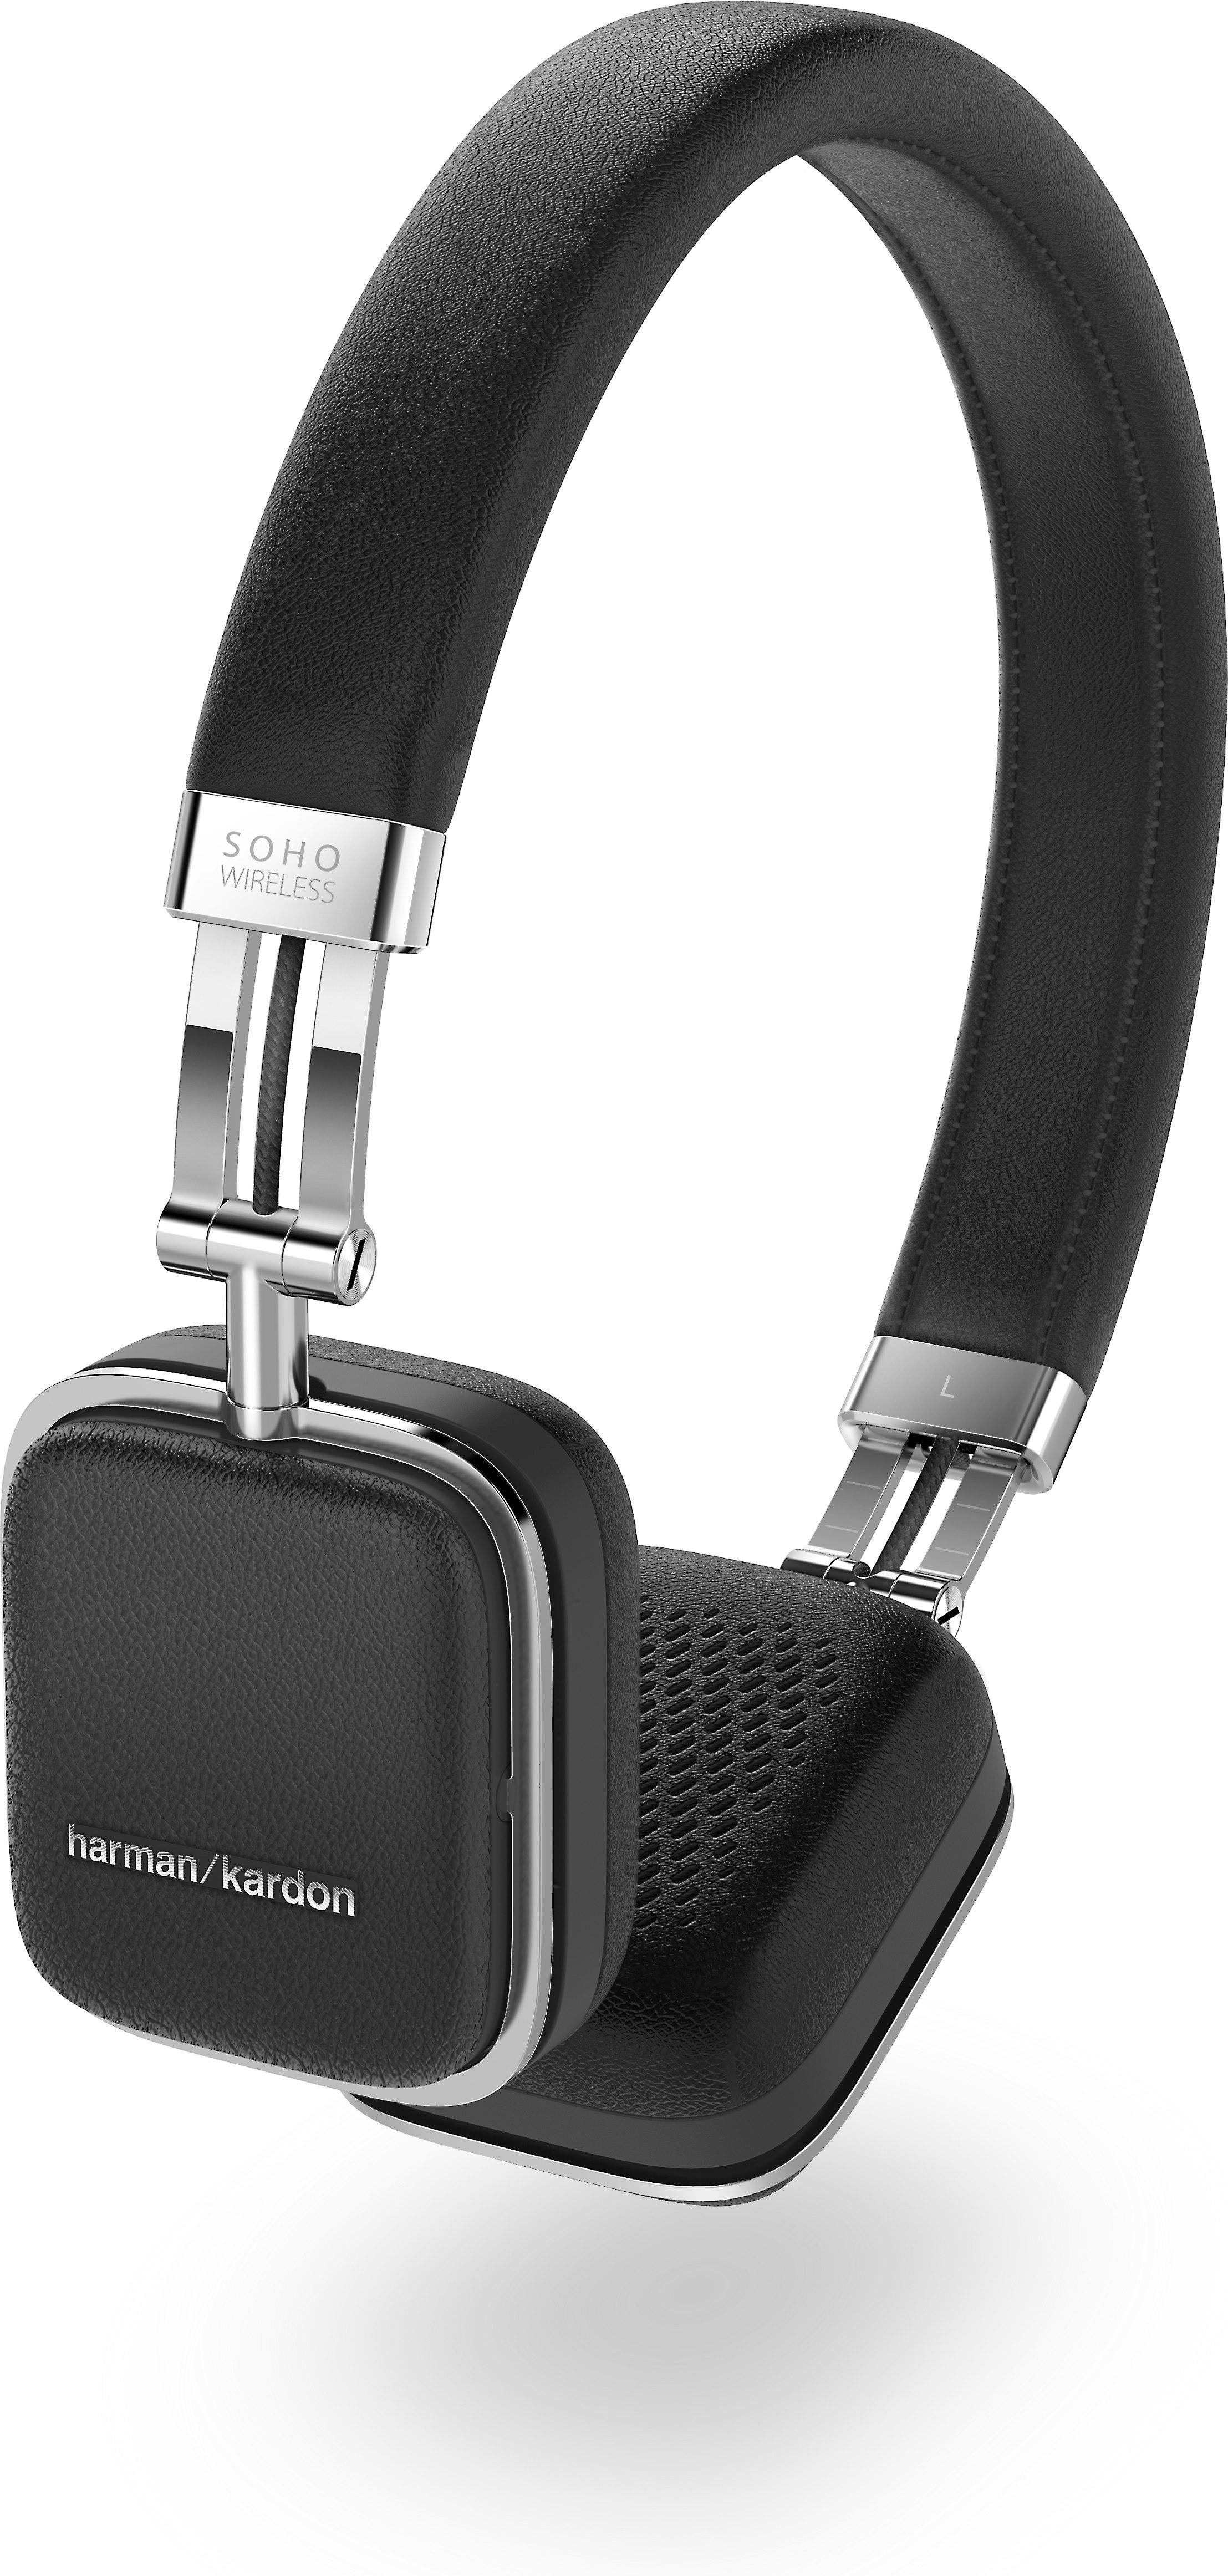 789ceb530cb Harman Kardon Soho Wireless On-ear headphones with Bluetooth® at Crutchfield